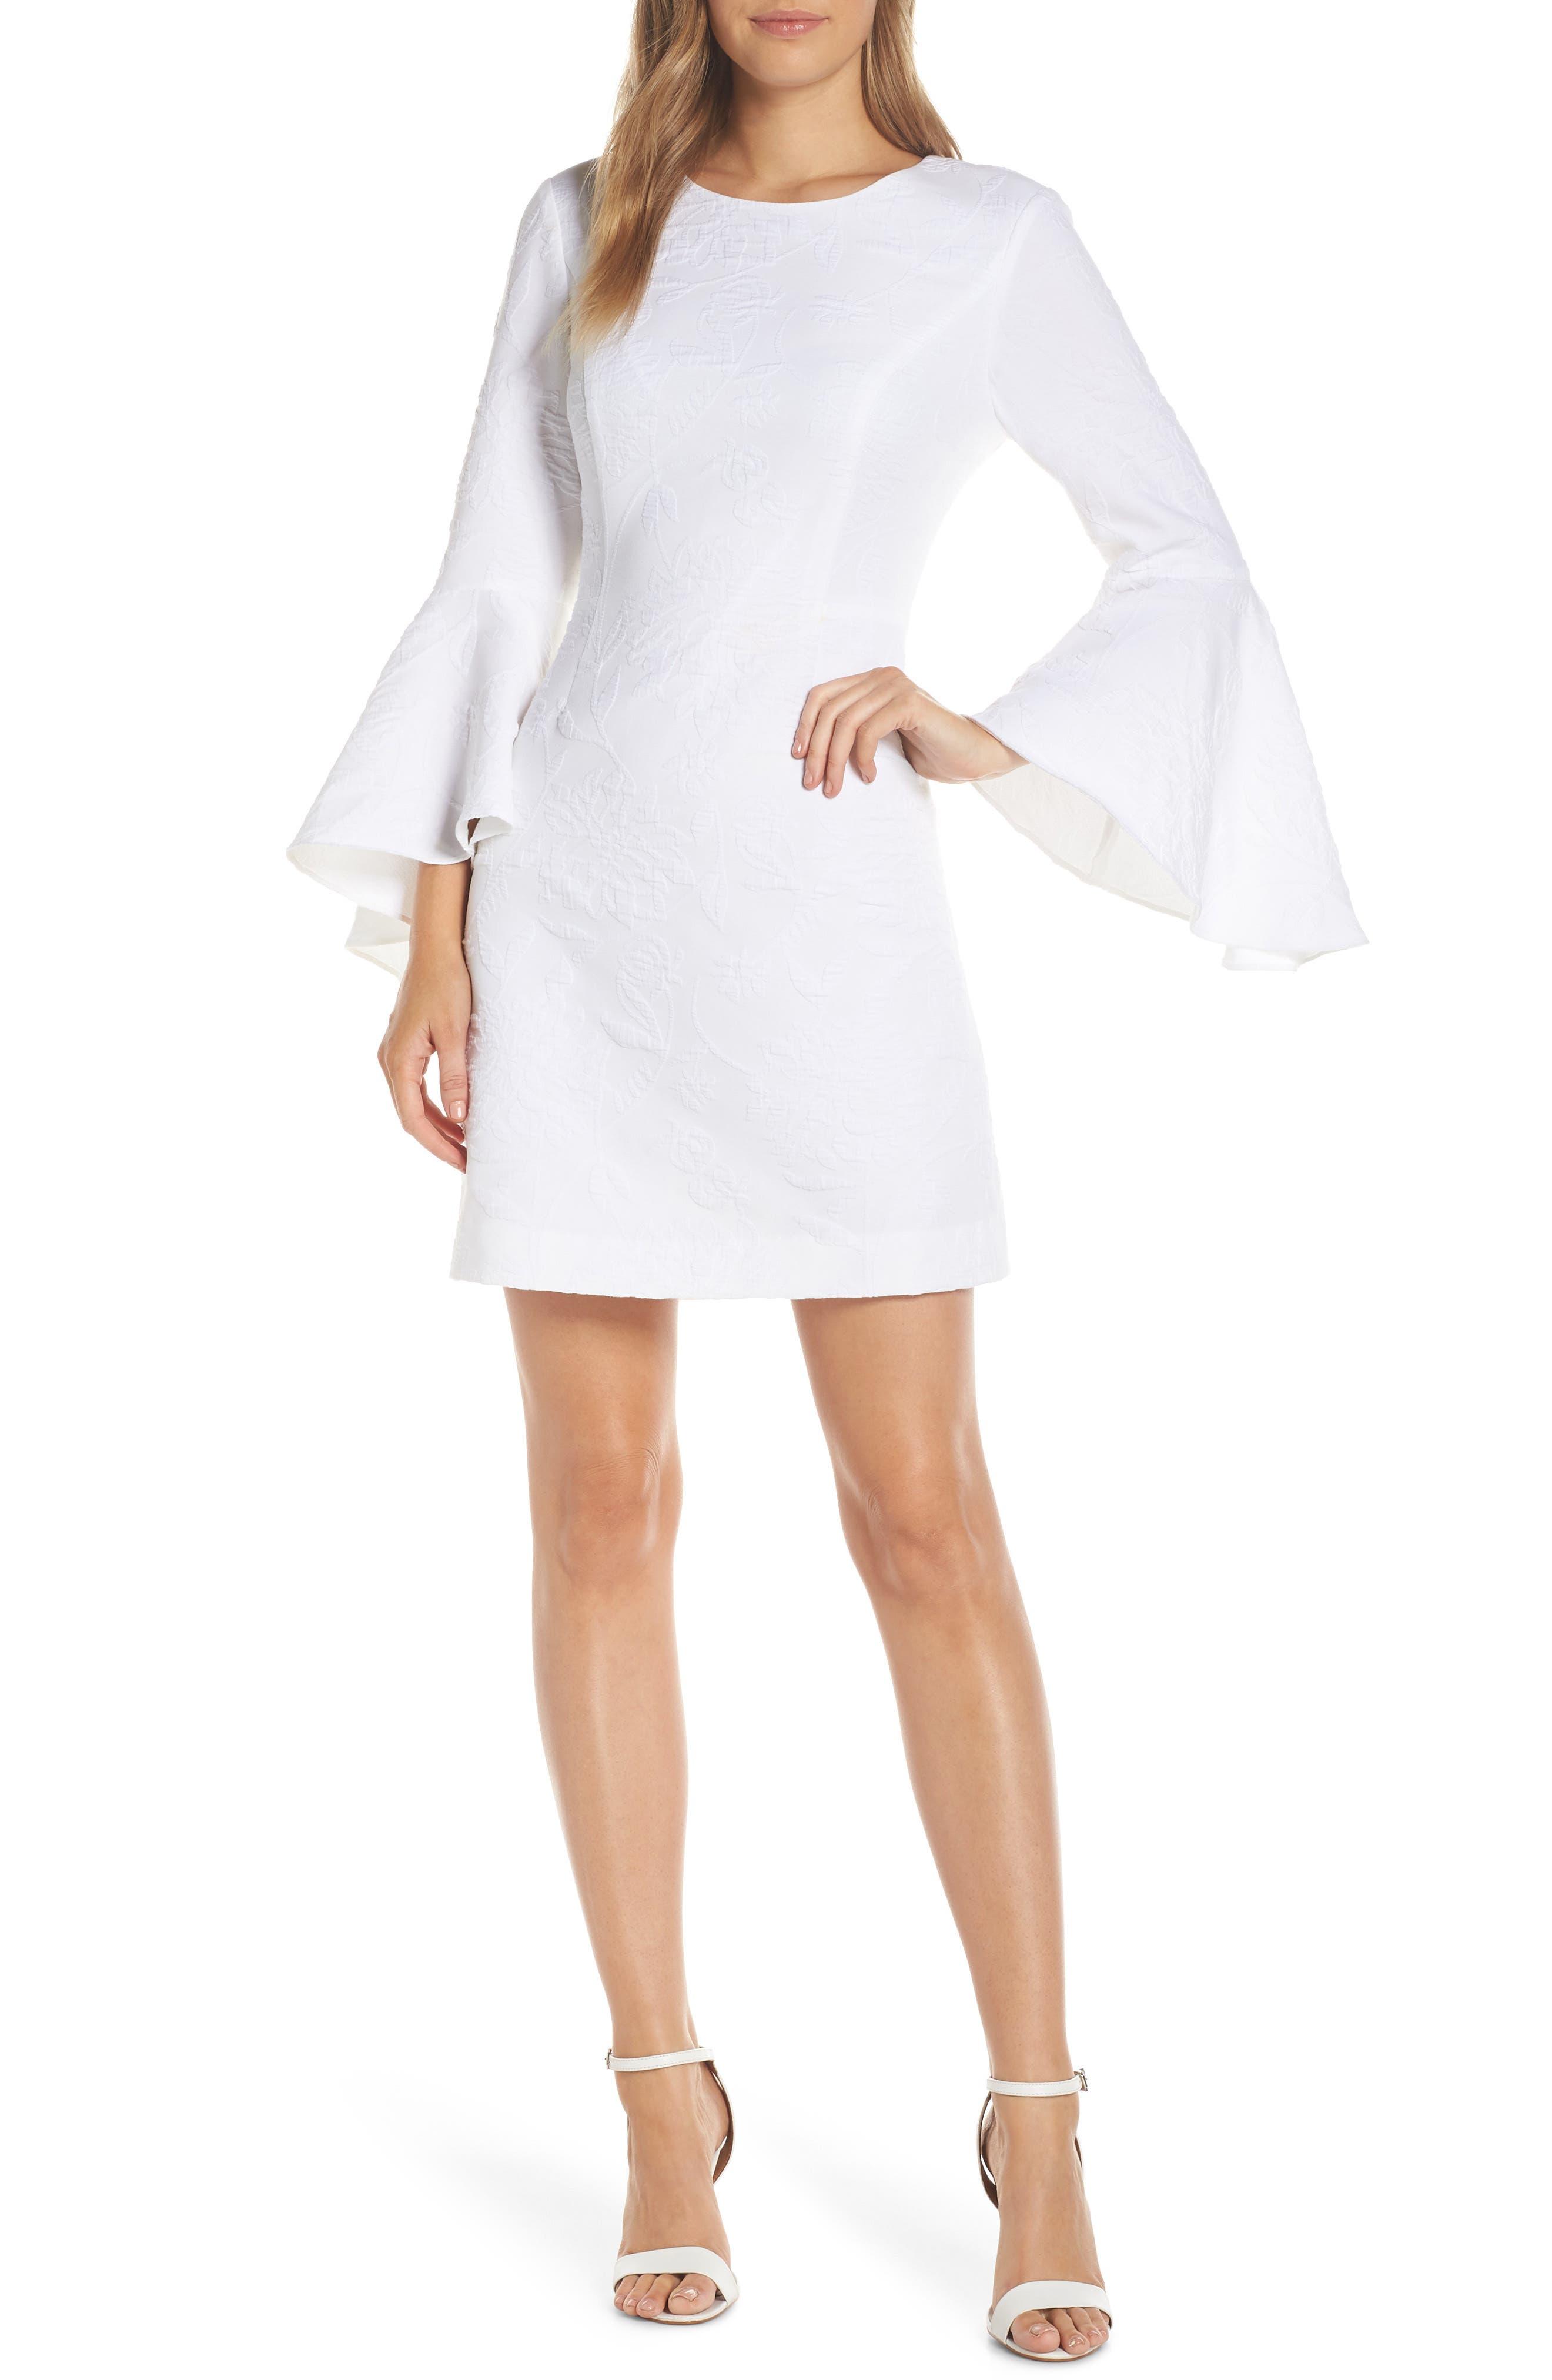 Lilly Pulitzer Kayla Bell Sleeve Dress, White